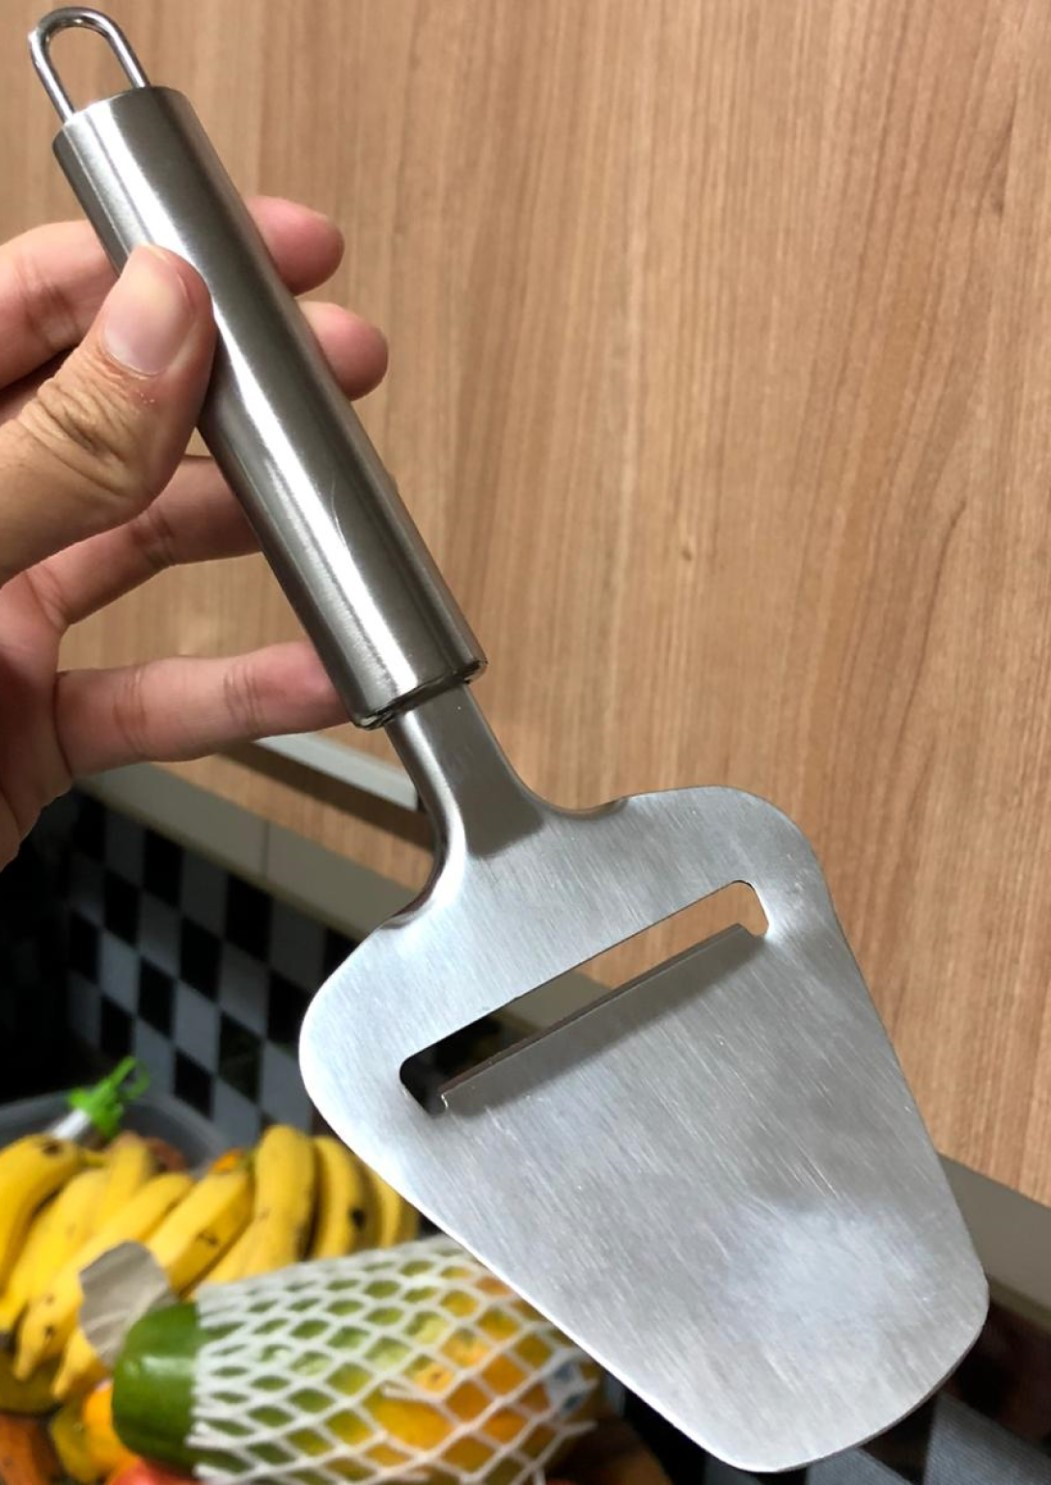 cortador de queijo manual plaina fatiador de queijos aço inox 23cm